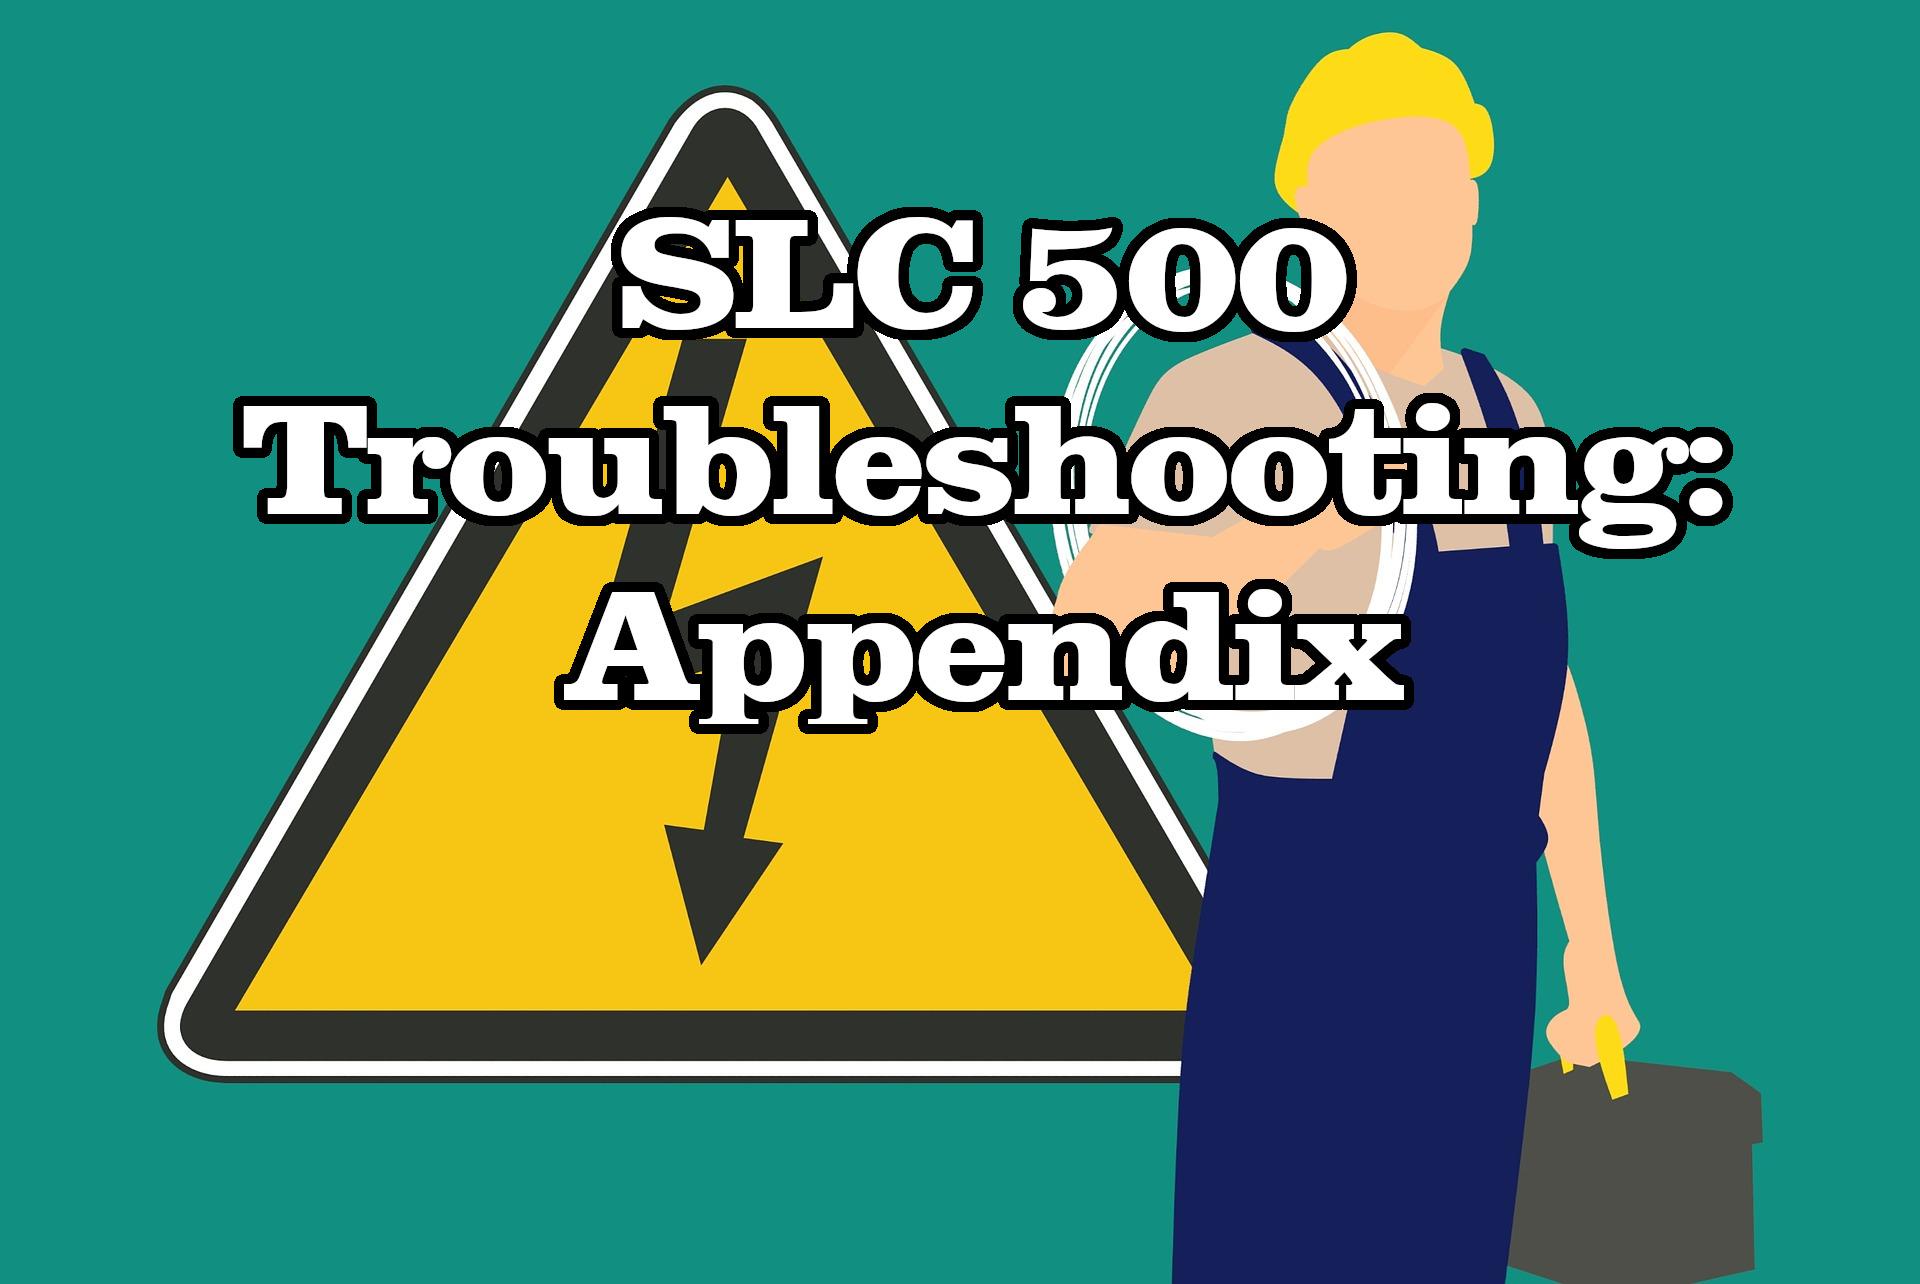 SLC 500 Troubleshooting: Appendix